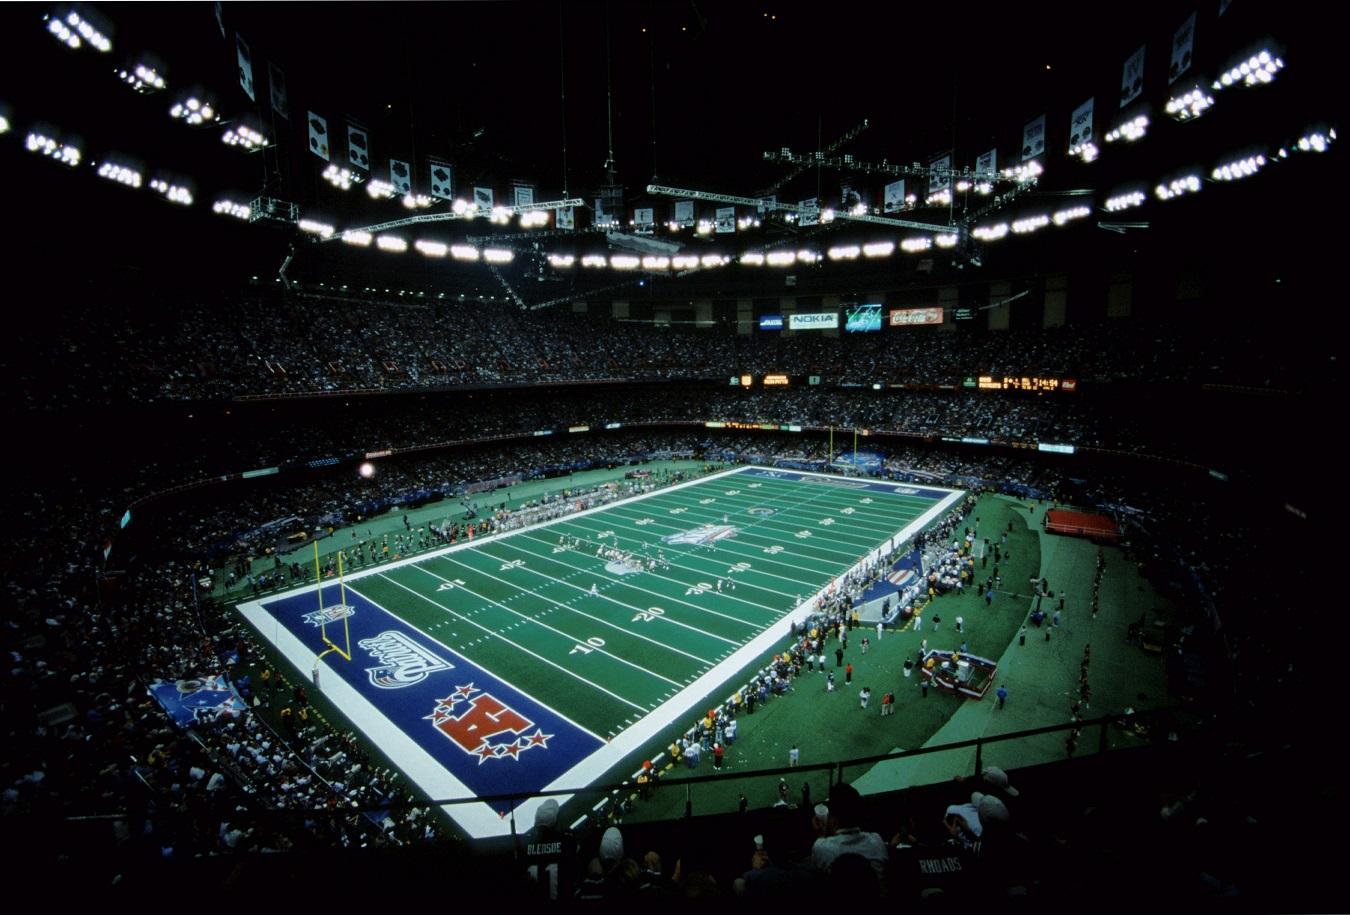 Super Bowl XXXVI at the Superdome